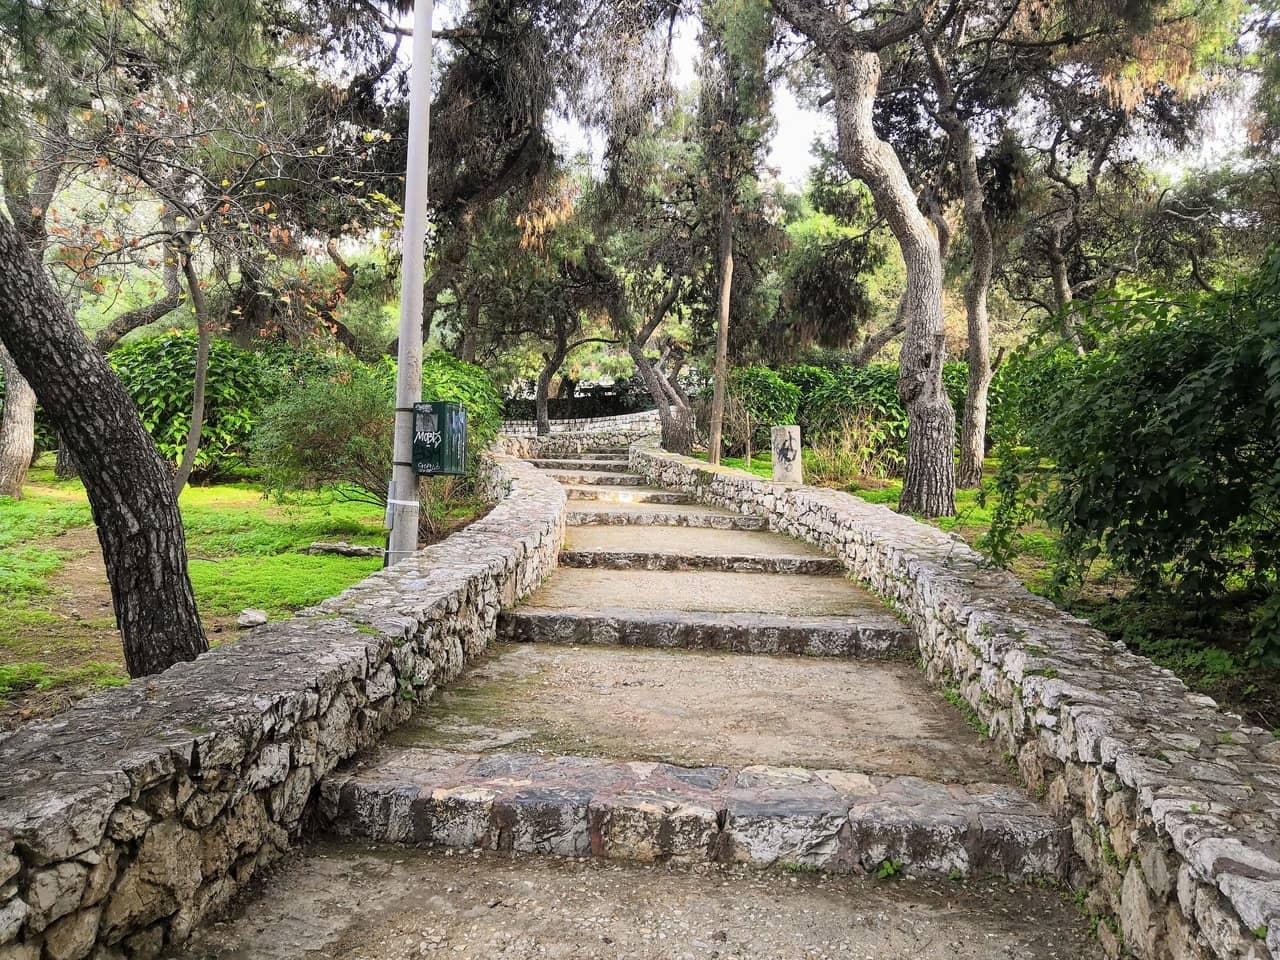 Ascending pathway inside a park